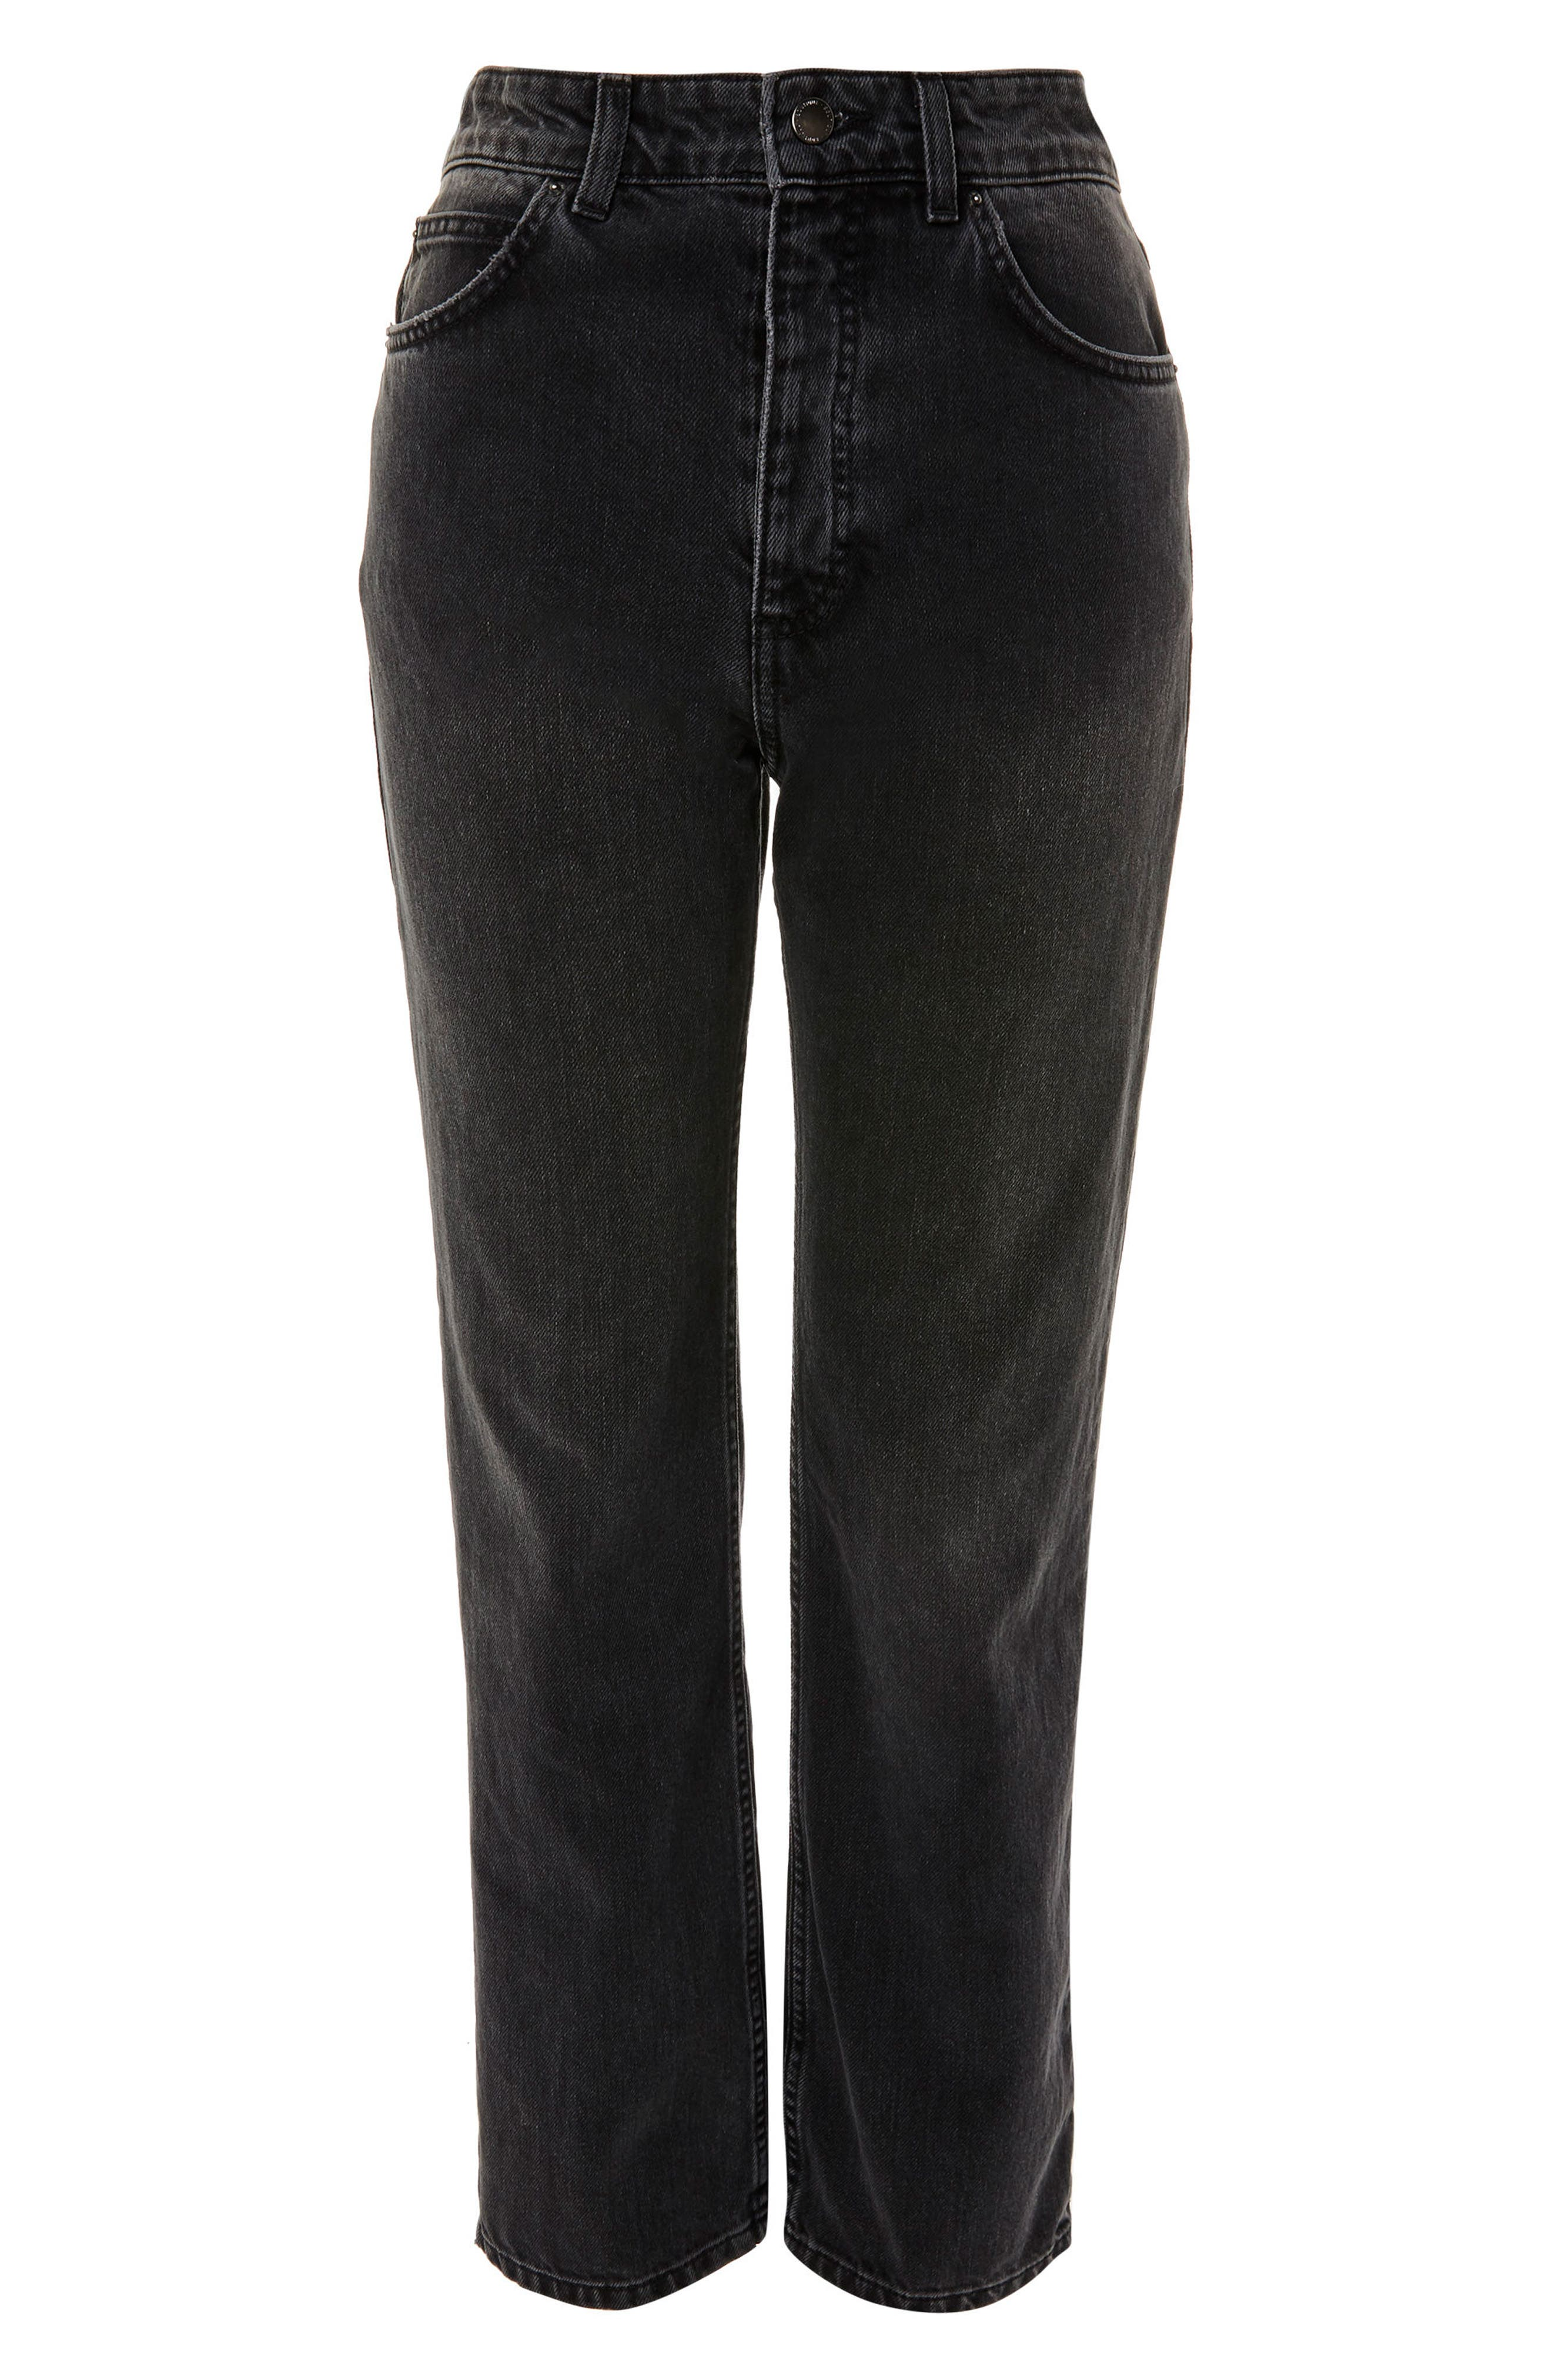 Washed Black Moto Straight Leg Jeans,                             Main thumbnail 1, color,                             003